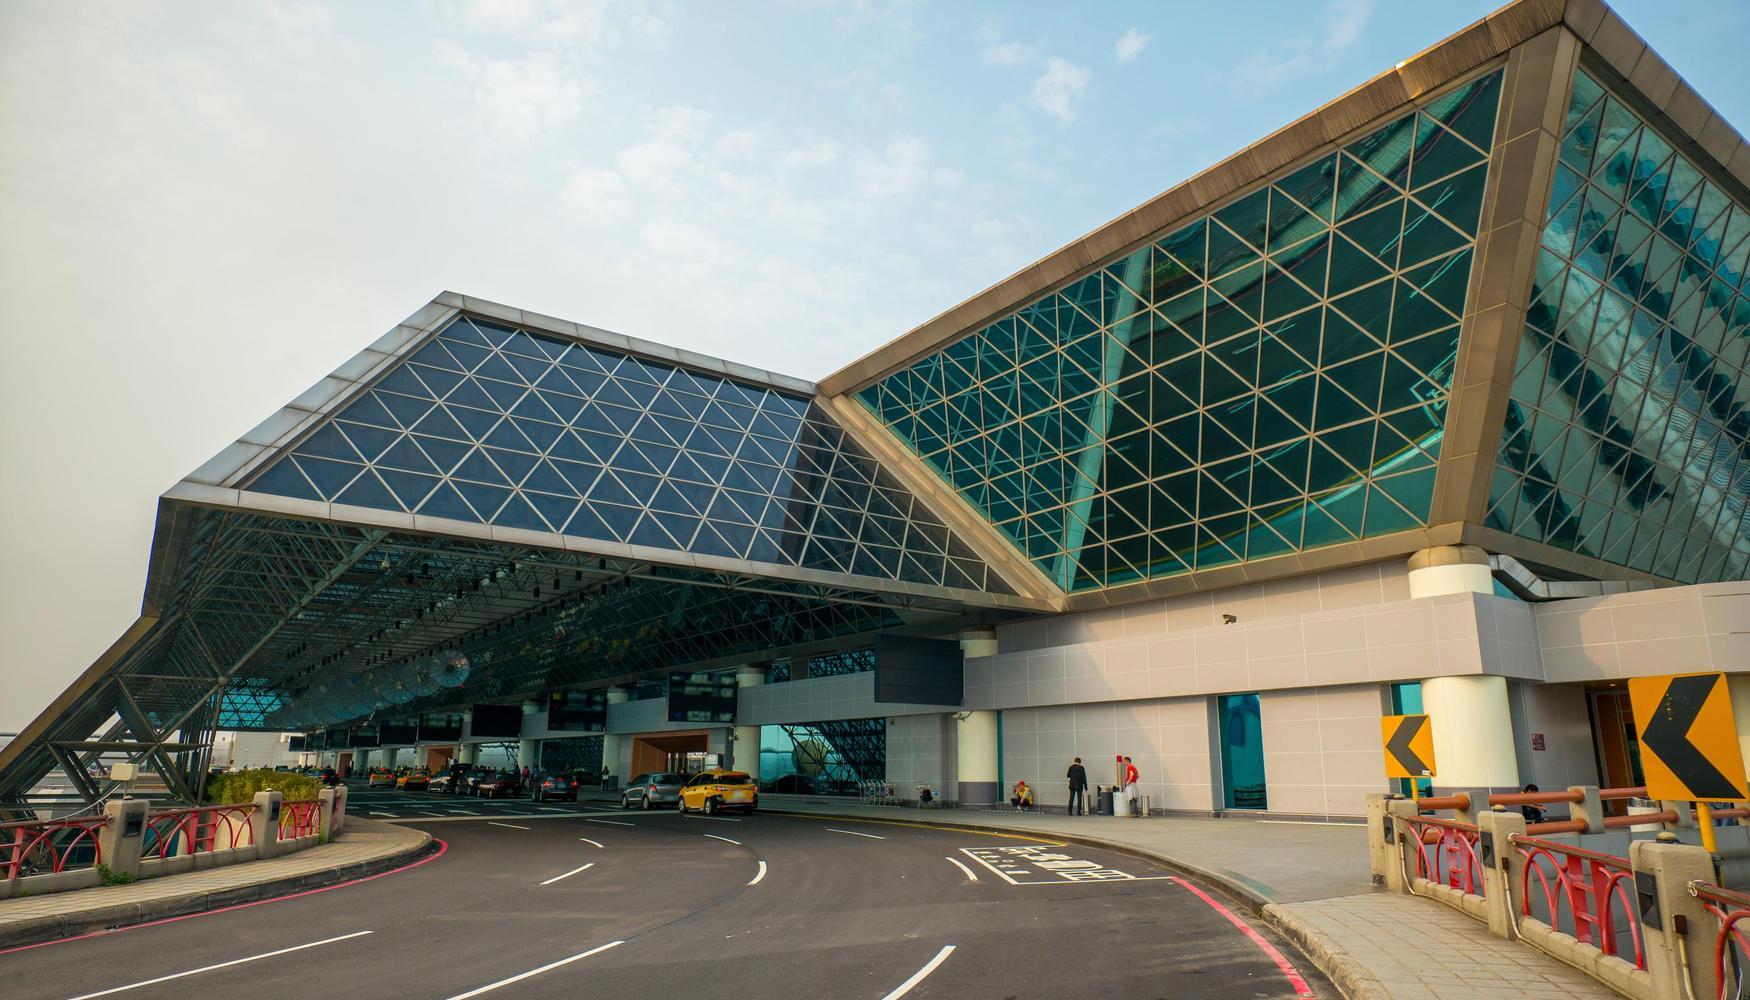 Auto de alquiler en Aeropuerto Taipéi Taiwán Taoyuan